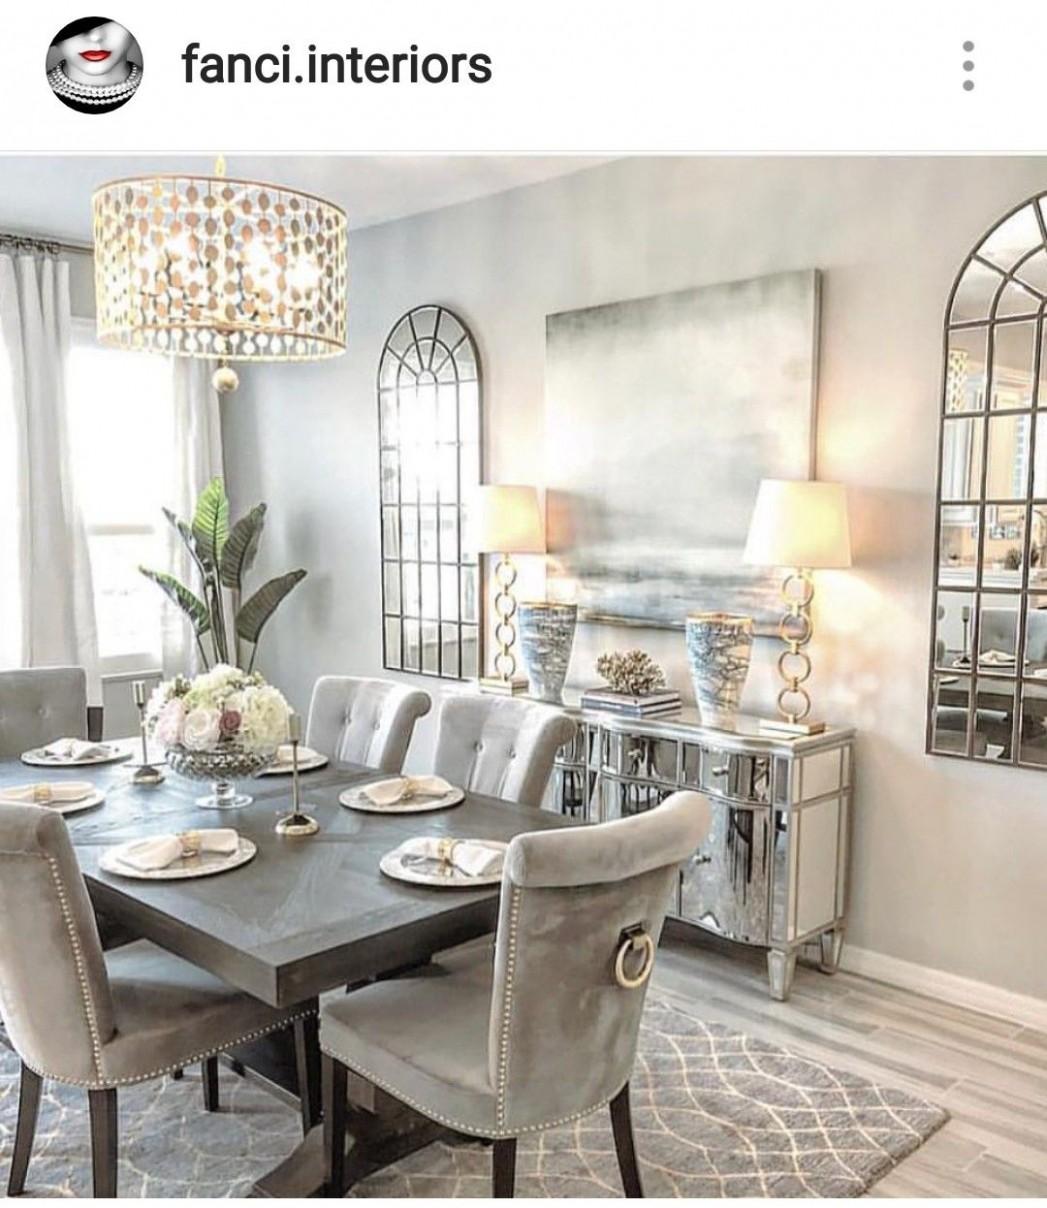 The Chic Technique: Cream and gray dining room idea